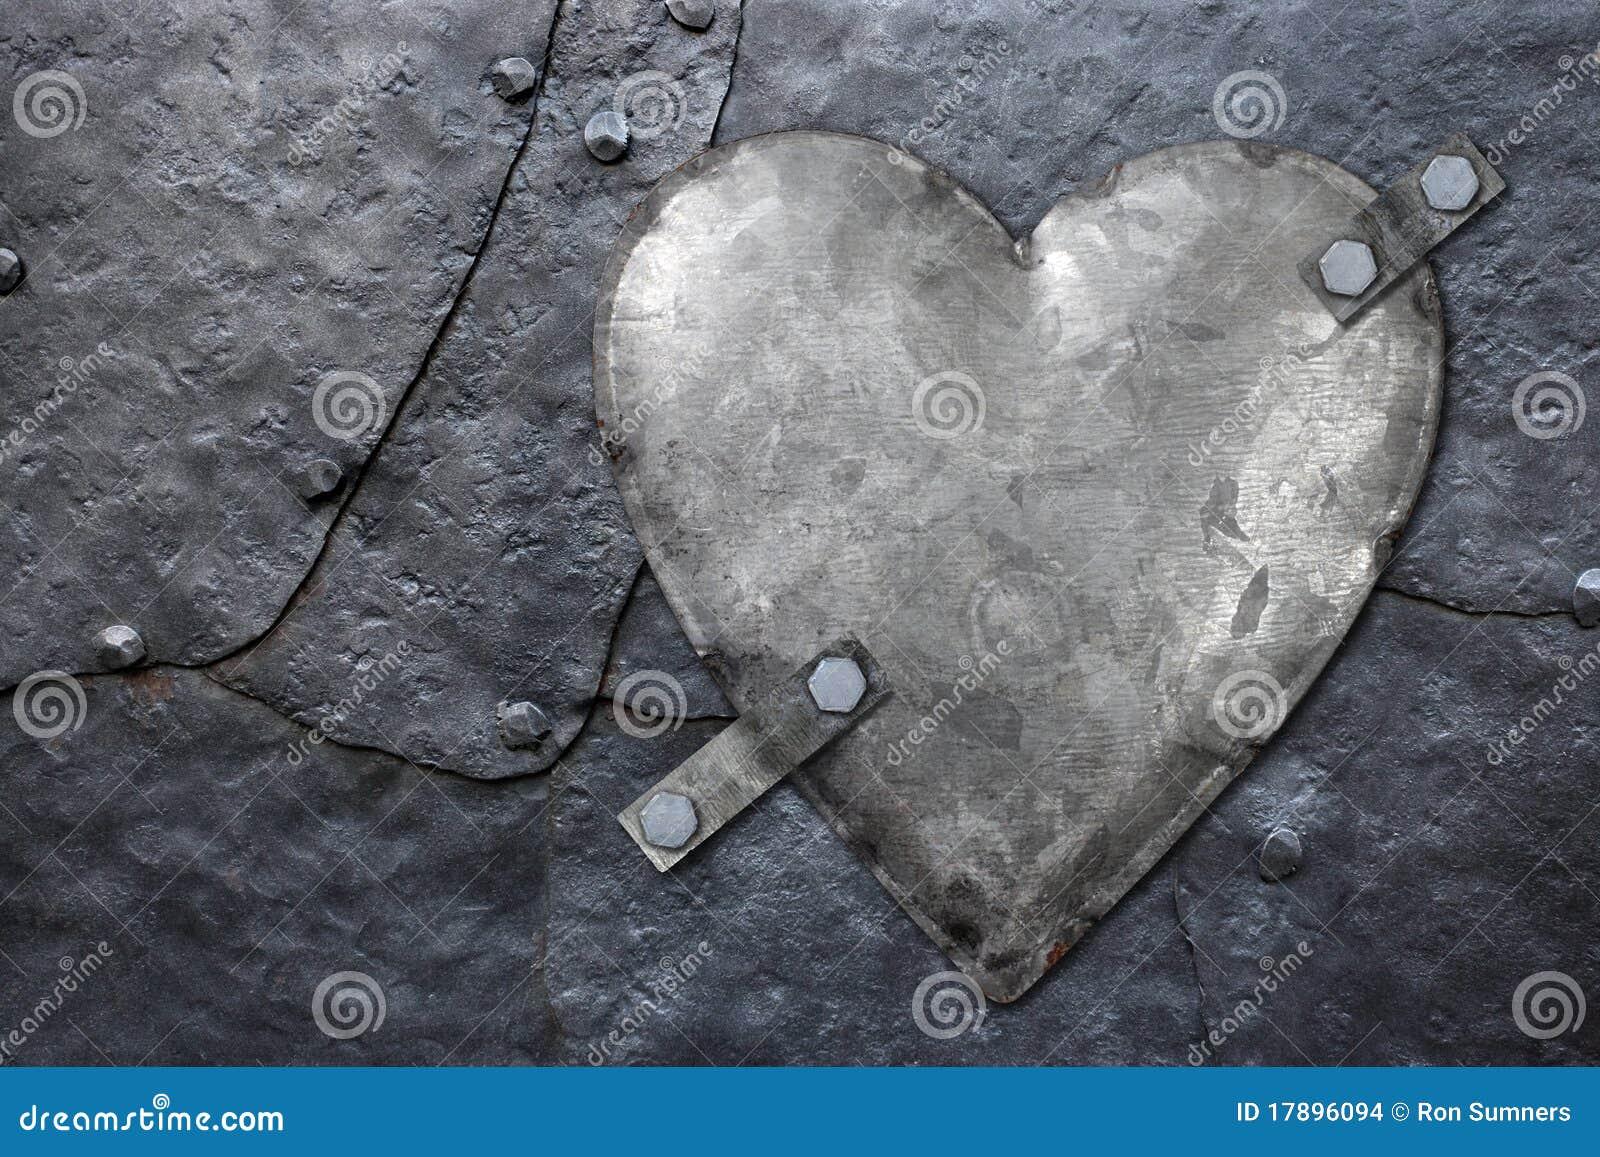 Galvanized metal heart